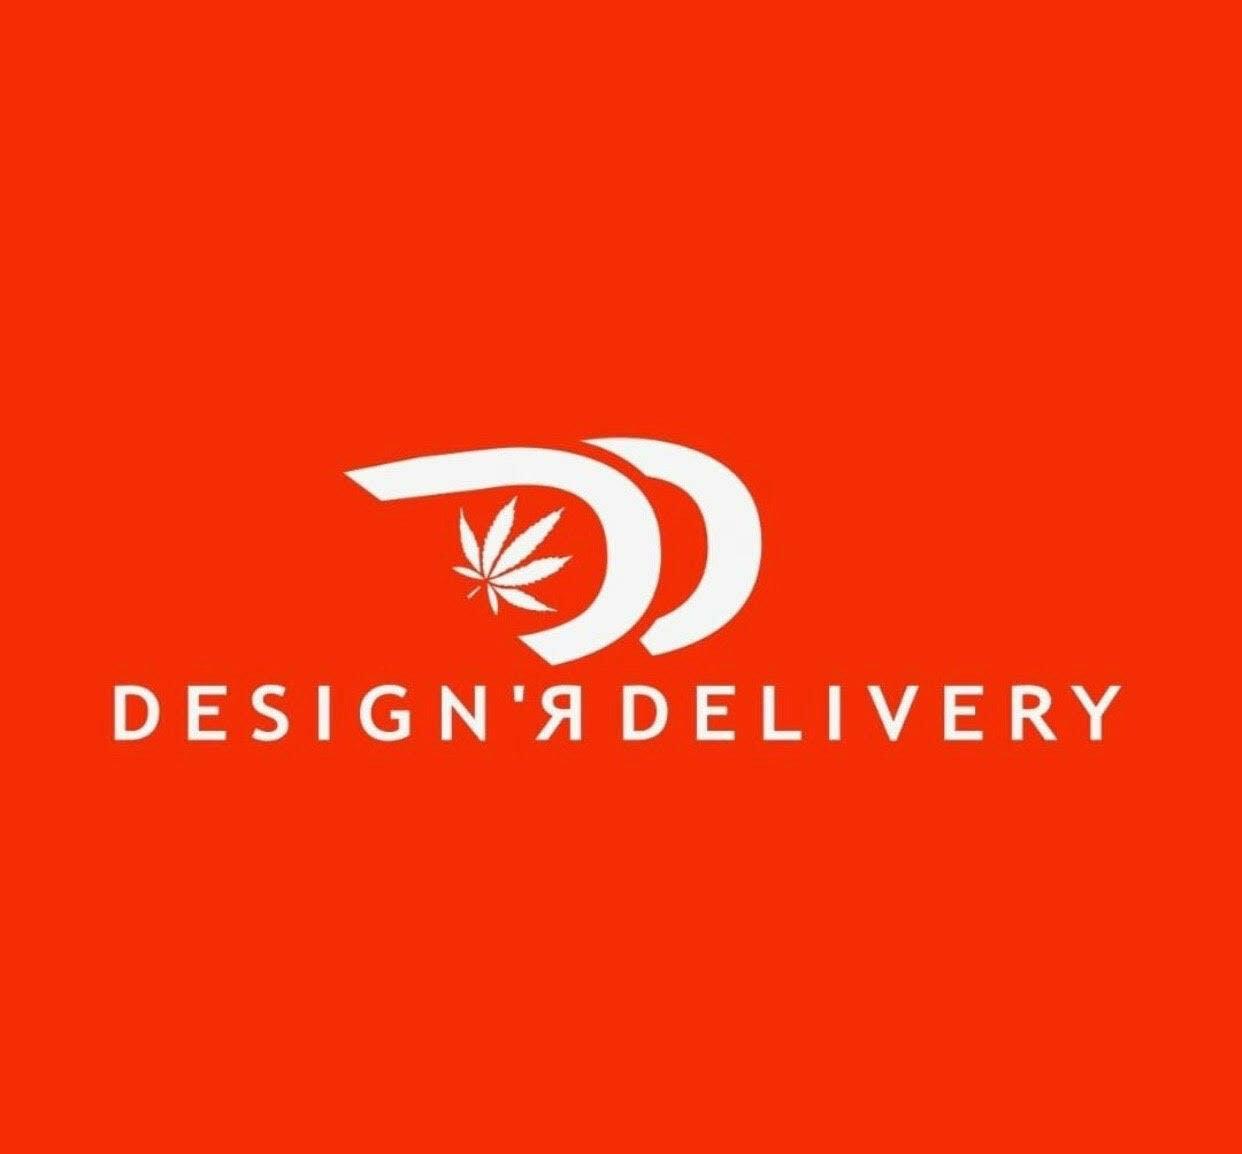 Designer Delivery | Store